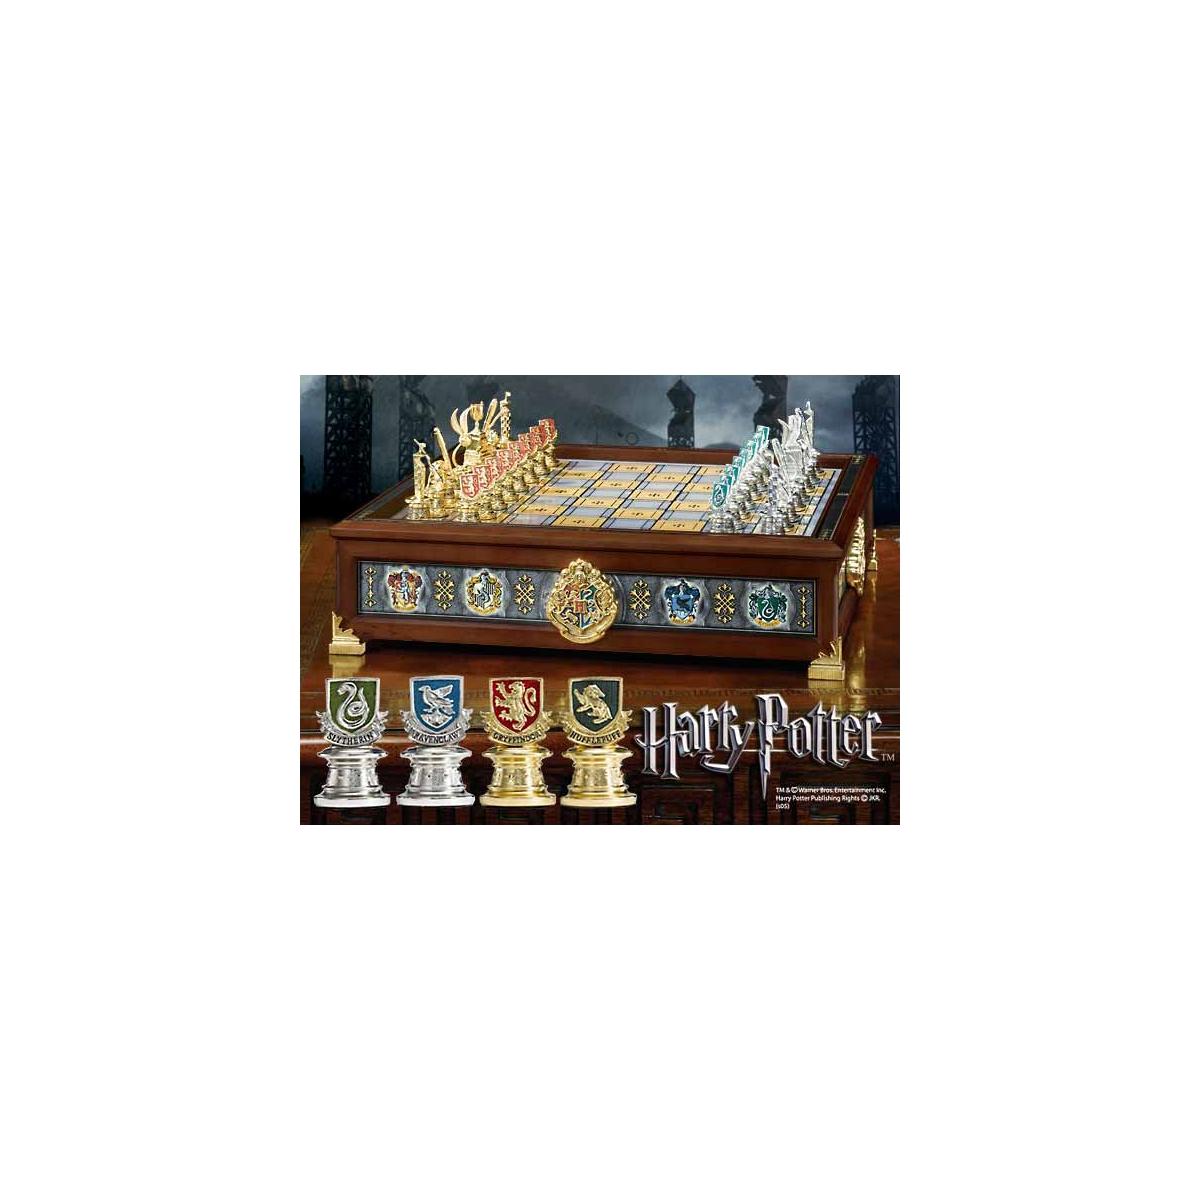 harry potter jeu d 39 echecs poudlard figurine discount. Black Bedroom Furniture Sets. Home Design Ideas